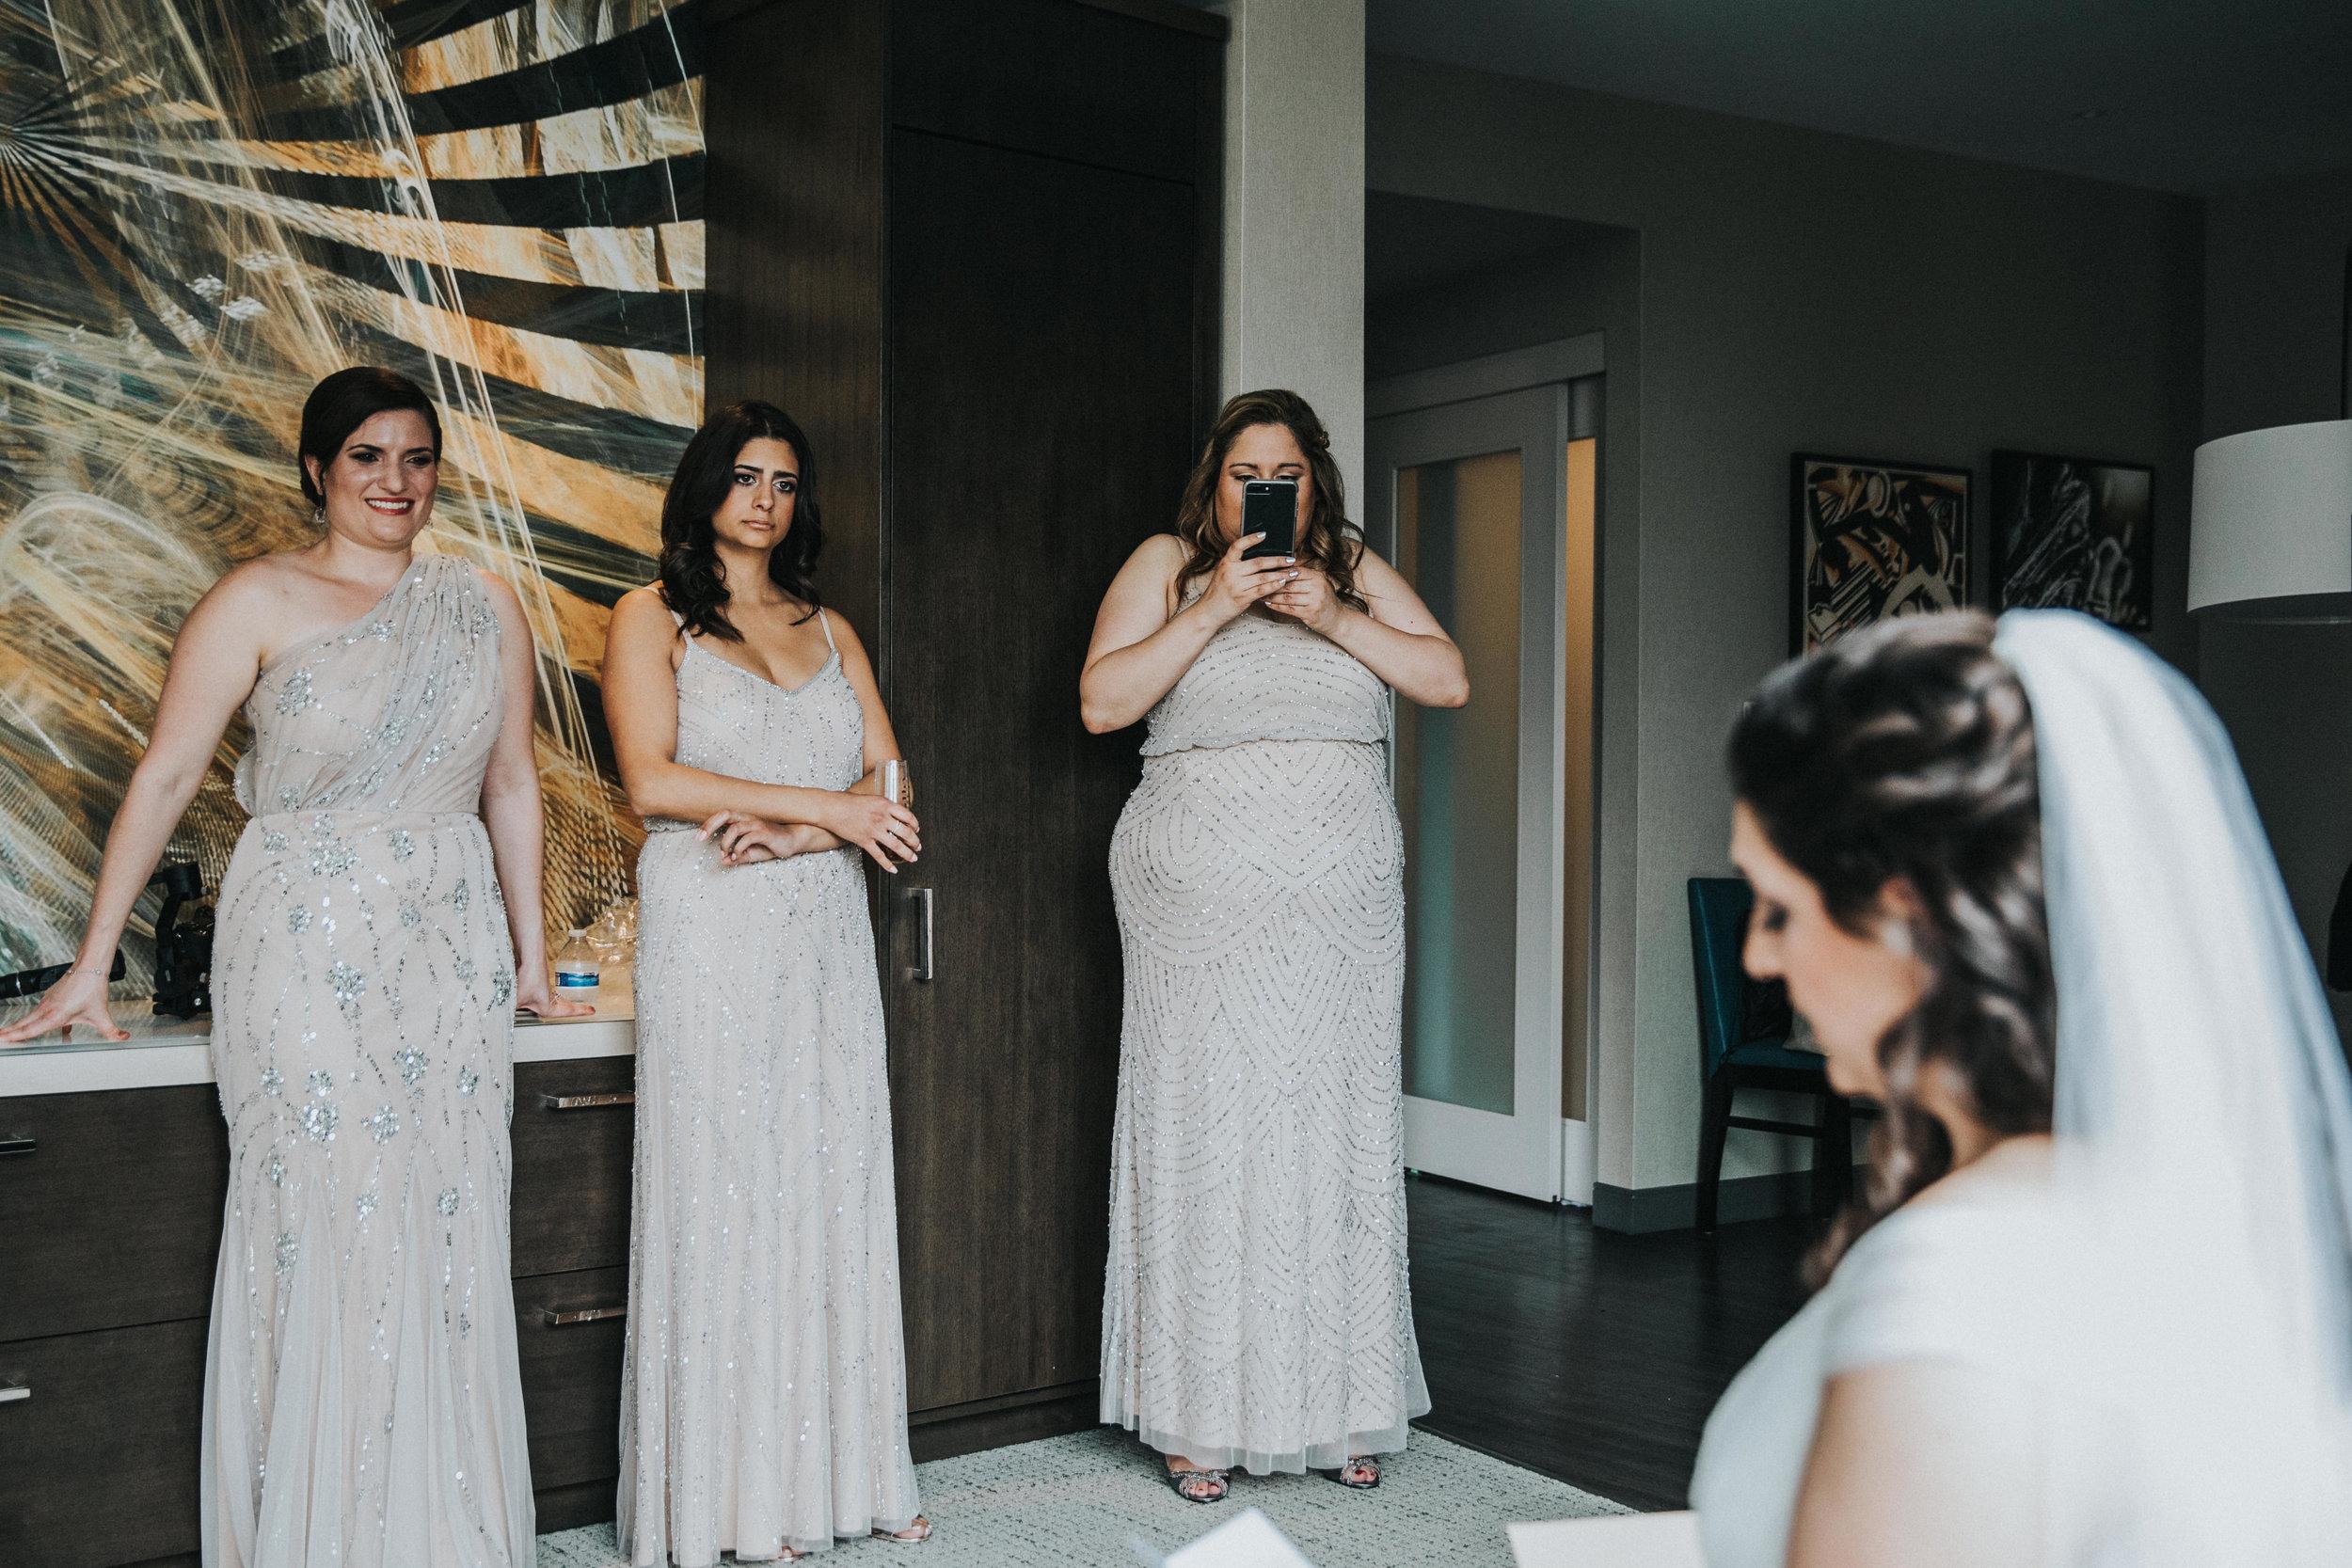 JennaLynnPhotography-NJWeddingPhotographer-Philadelphia-Wedding-ArtsBallroom-GettingReady-94.jpg